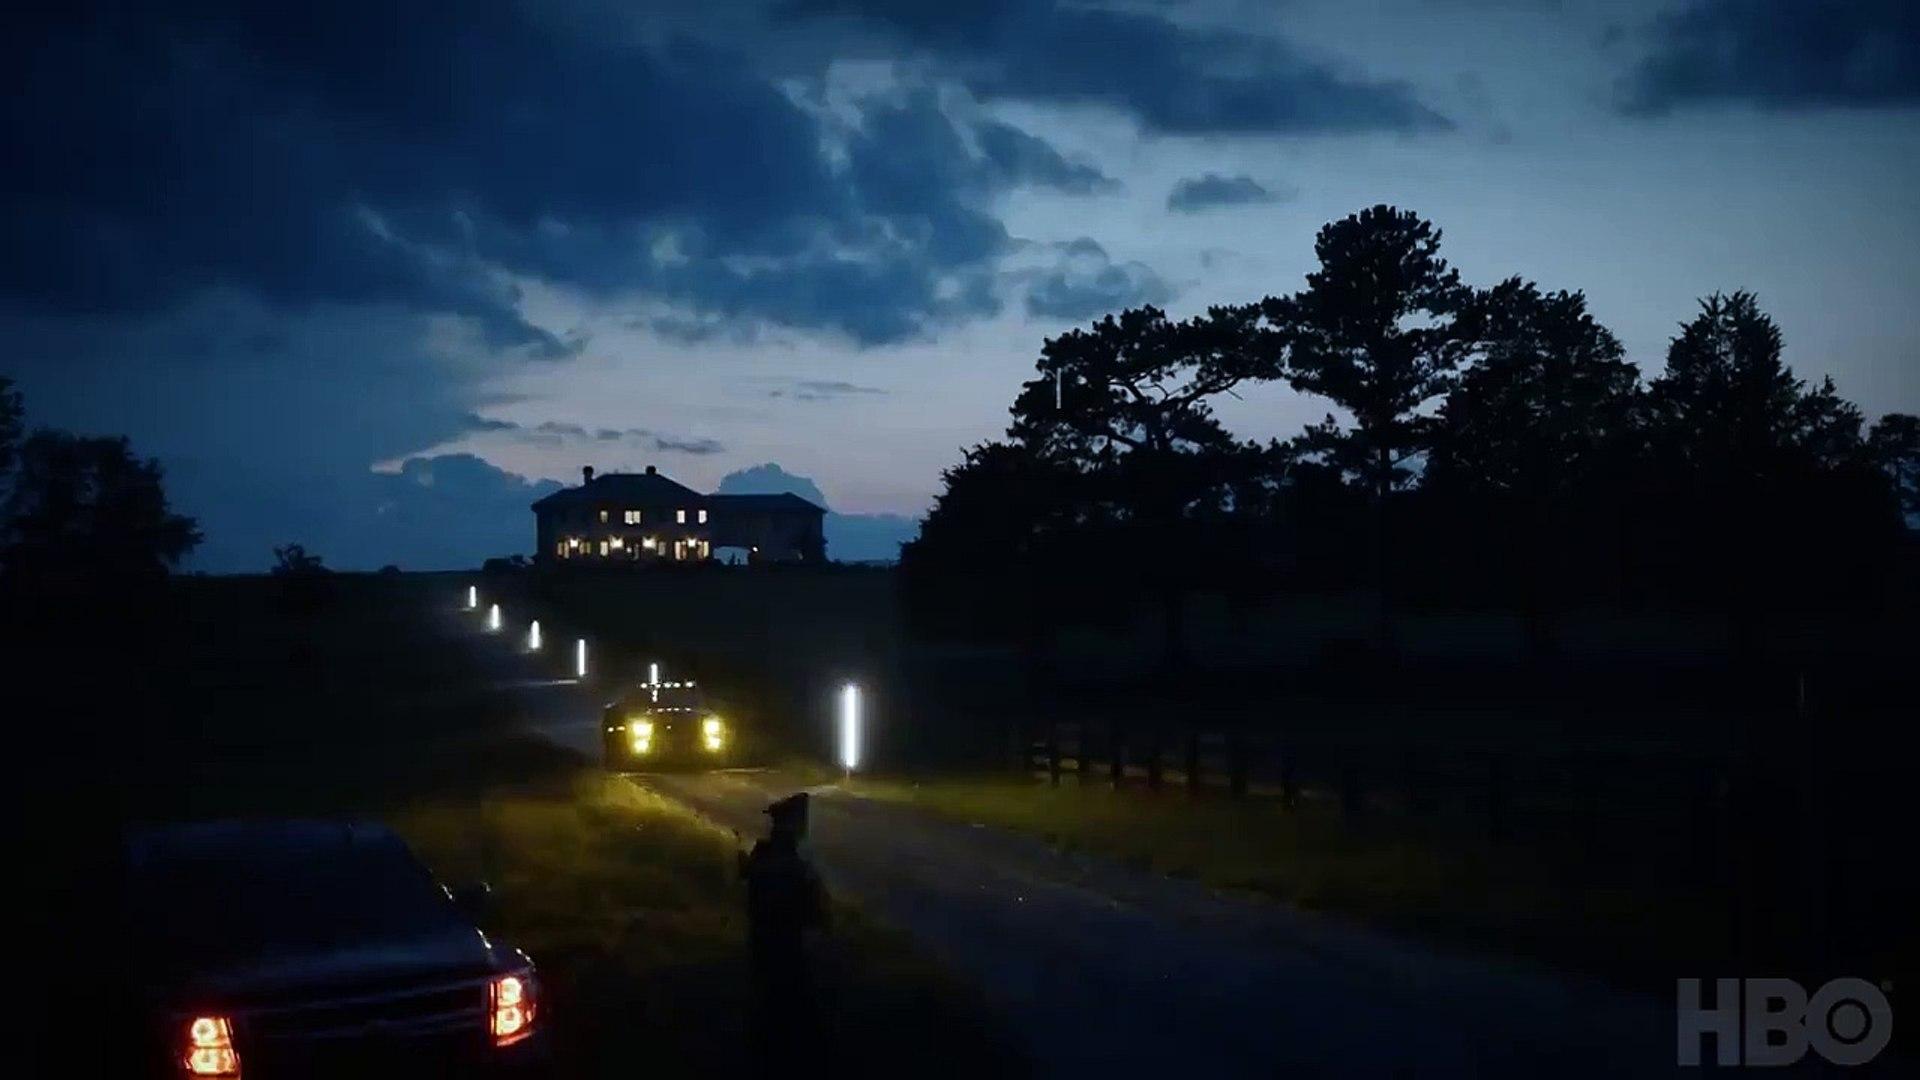 Watchmen - Teaser trailer - Peeas Studios